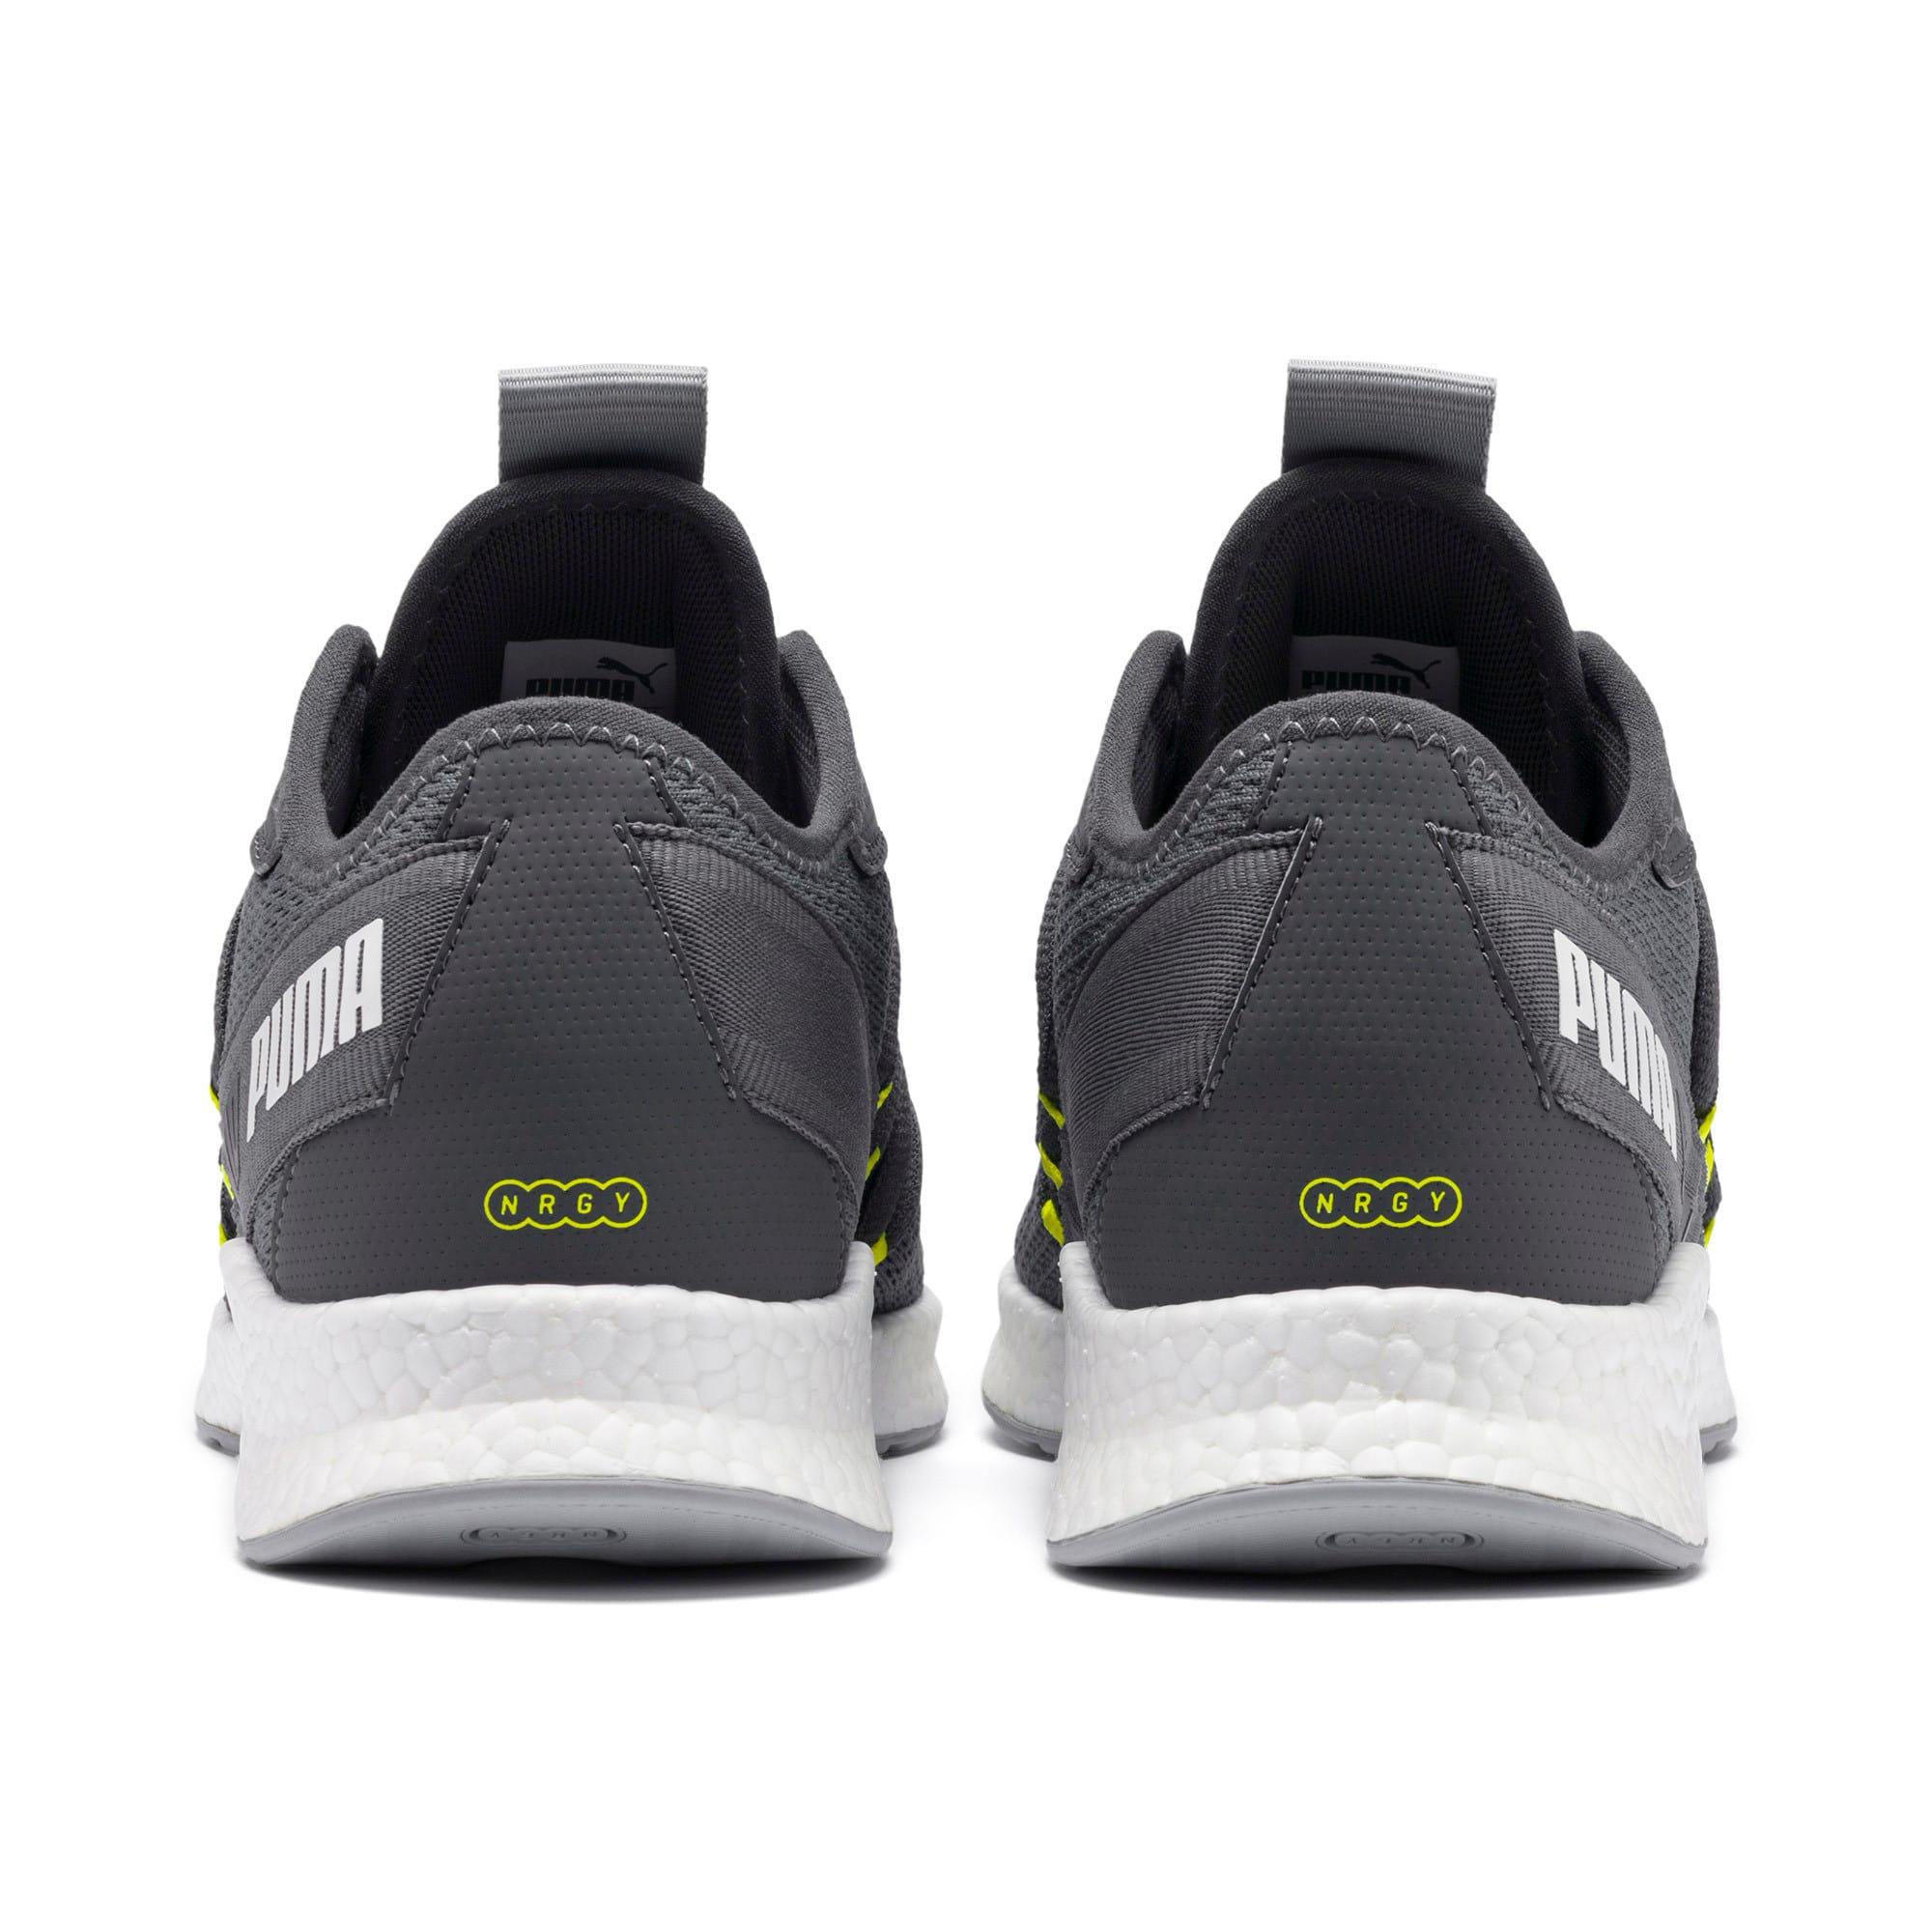 Thumbnail 4 of NRGY Star Running Shoes, CASTLEROCK-White-Yellow, medium